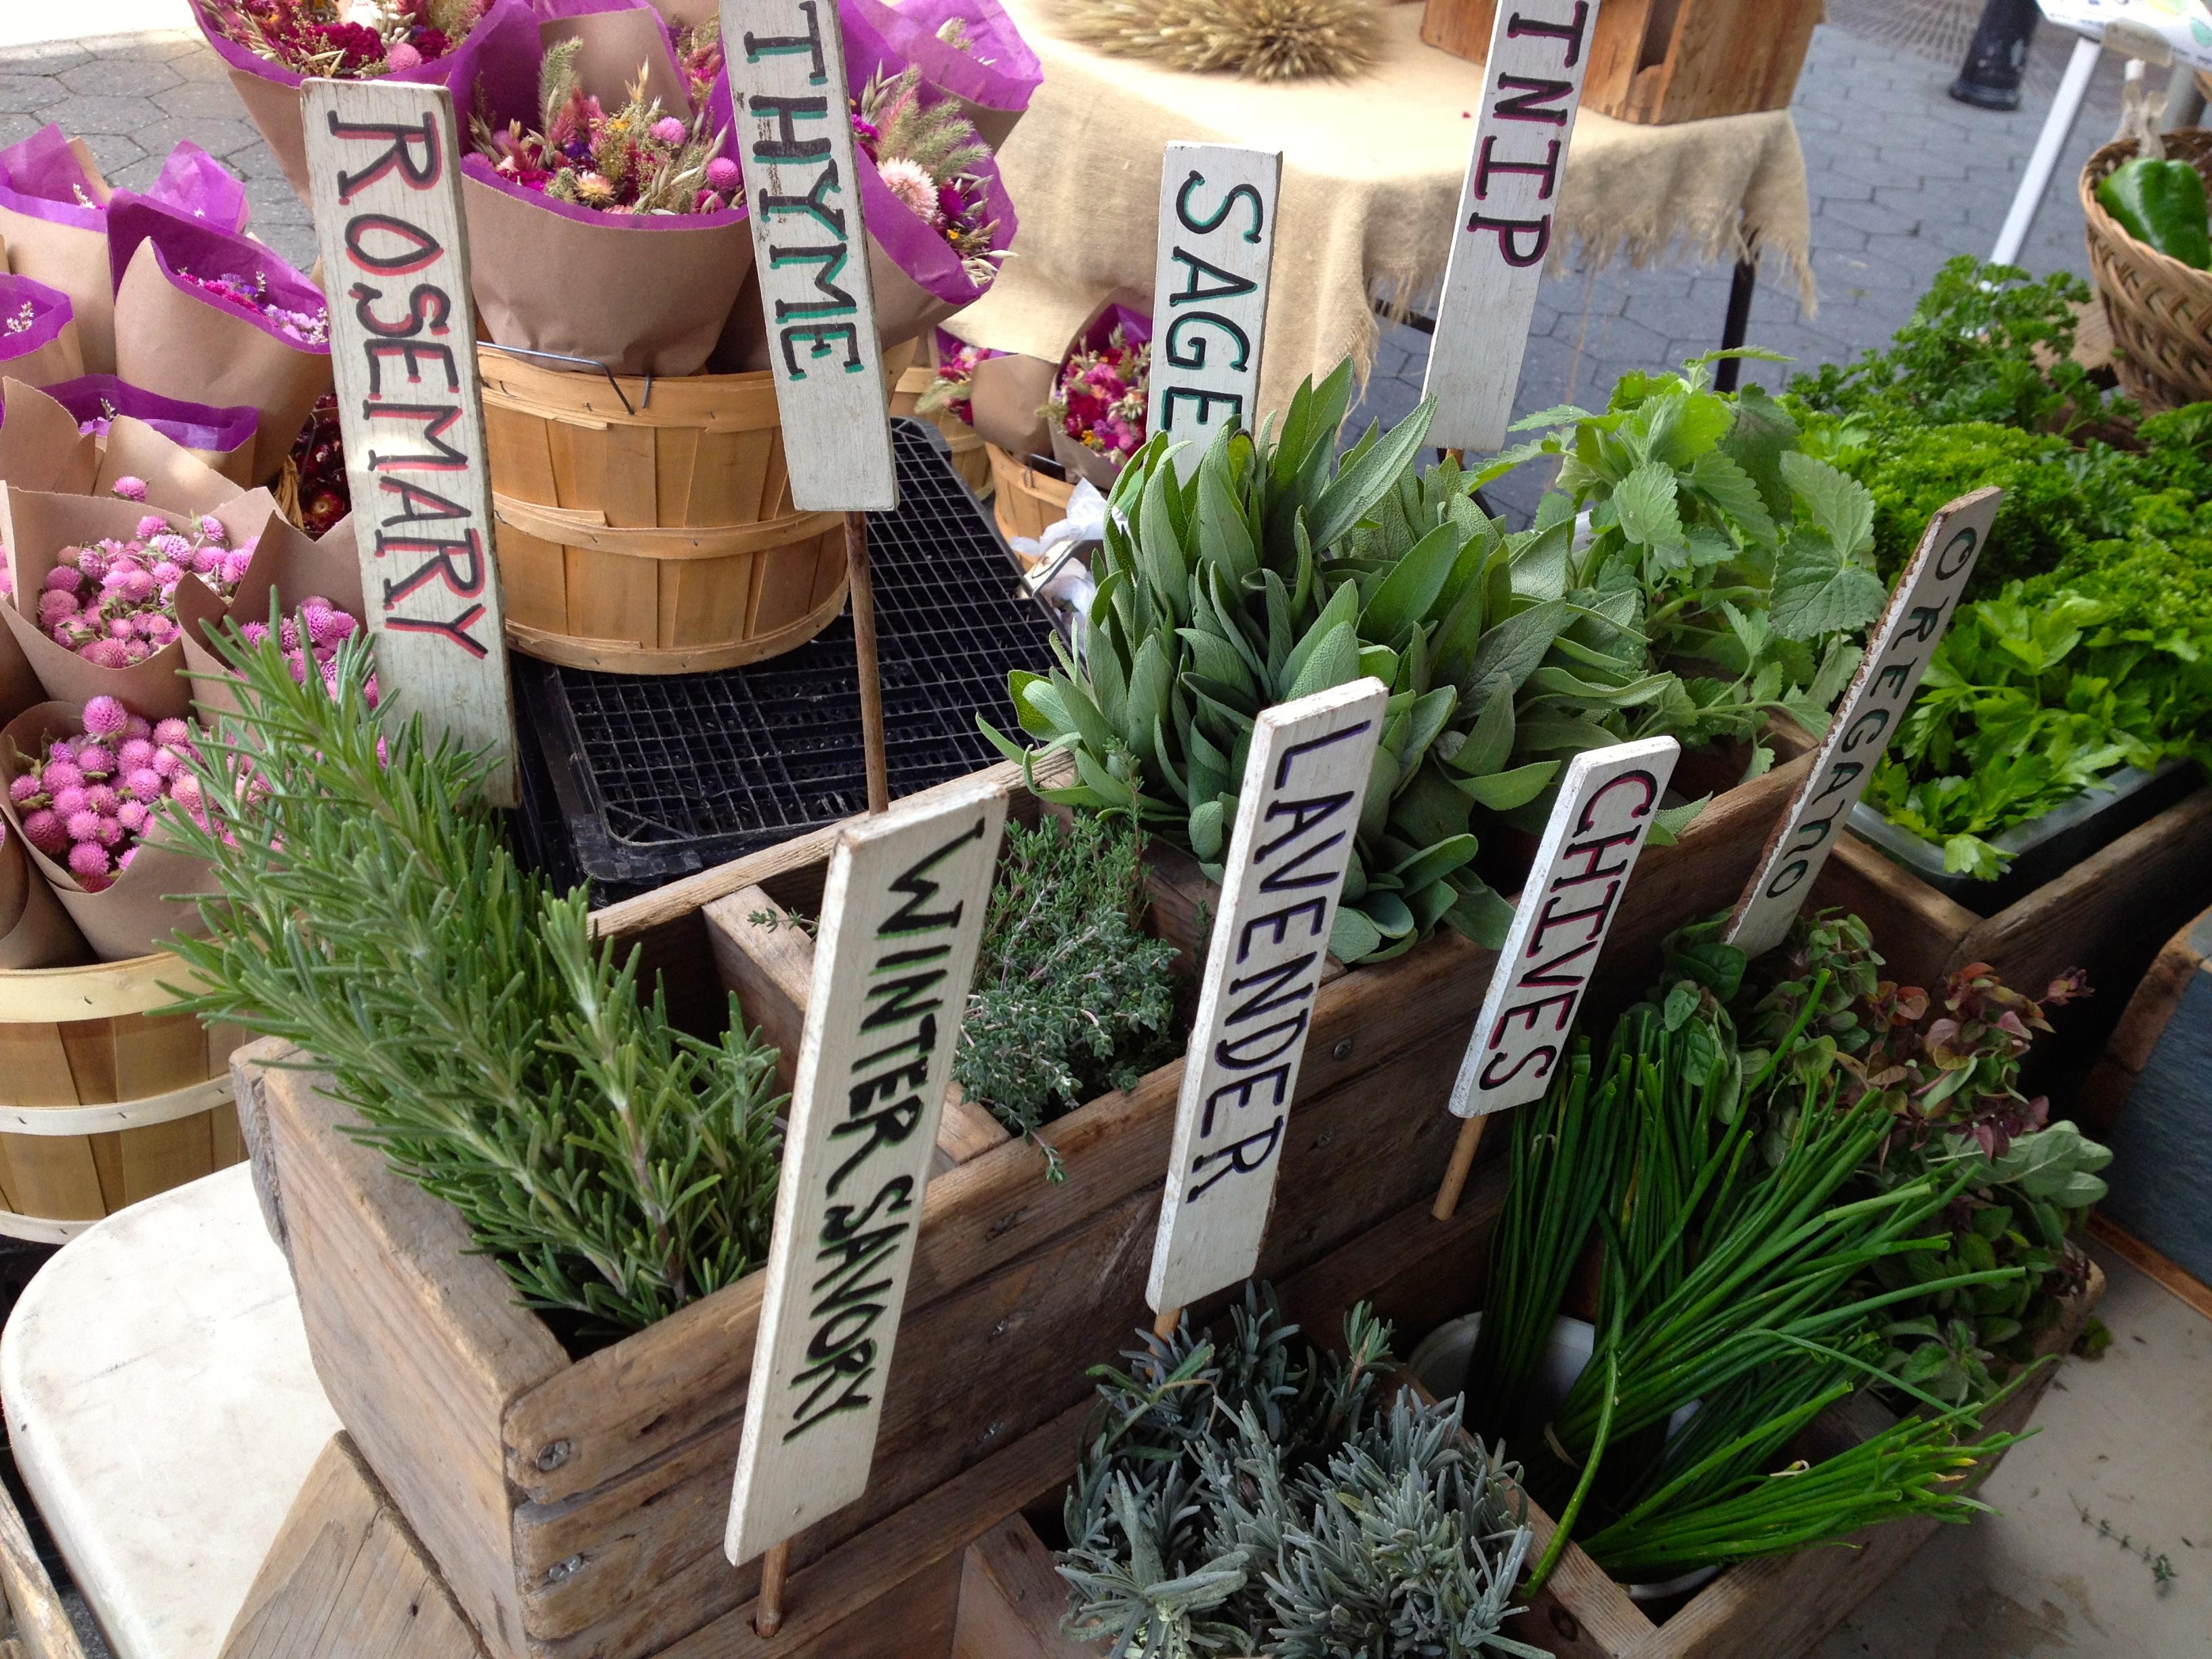 Union Square Greenmarket herbs